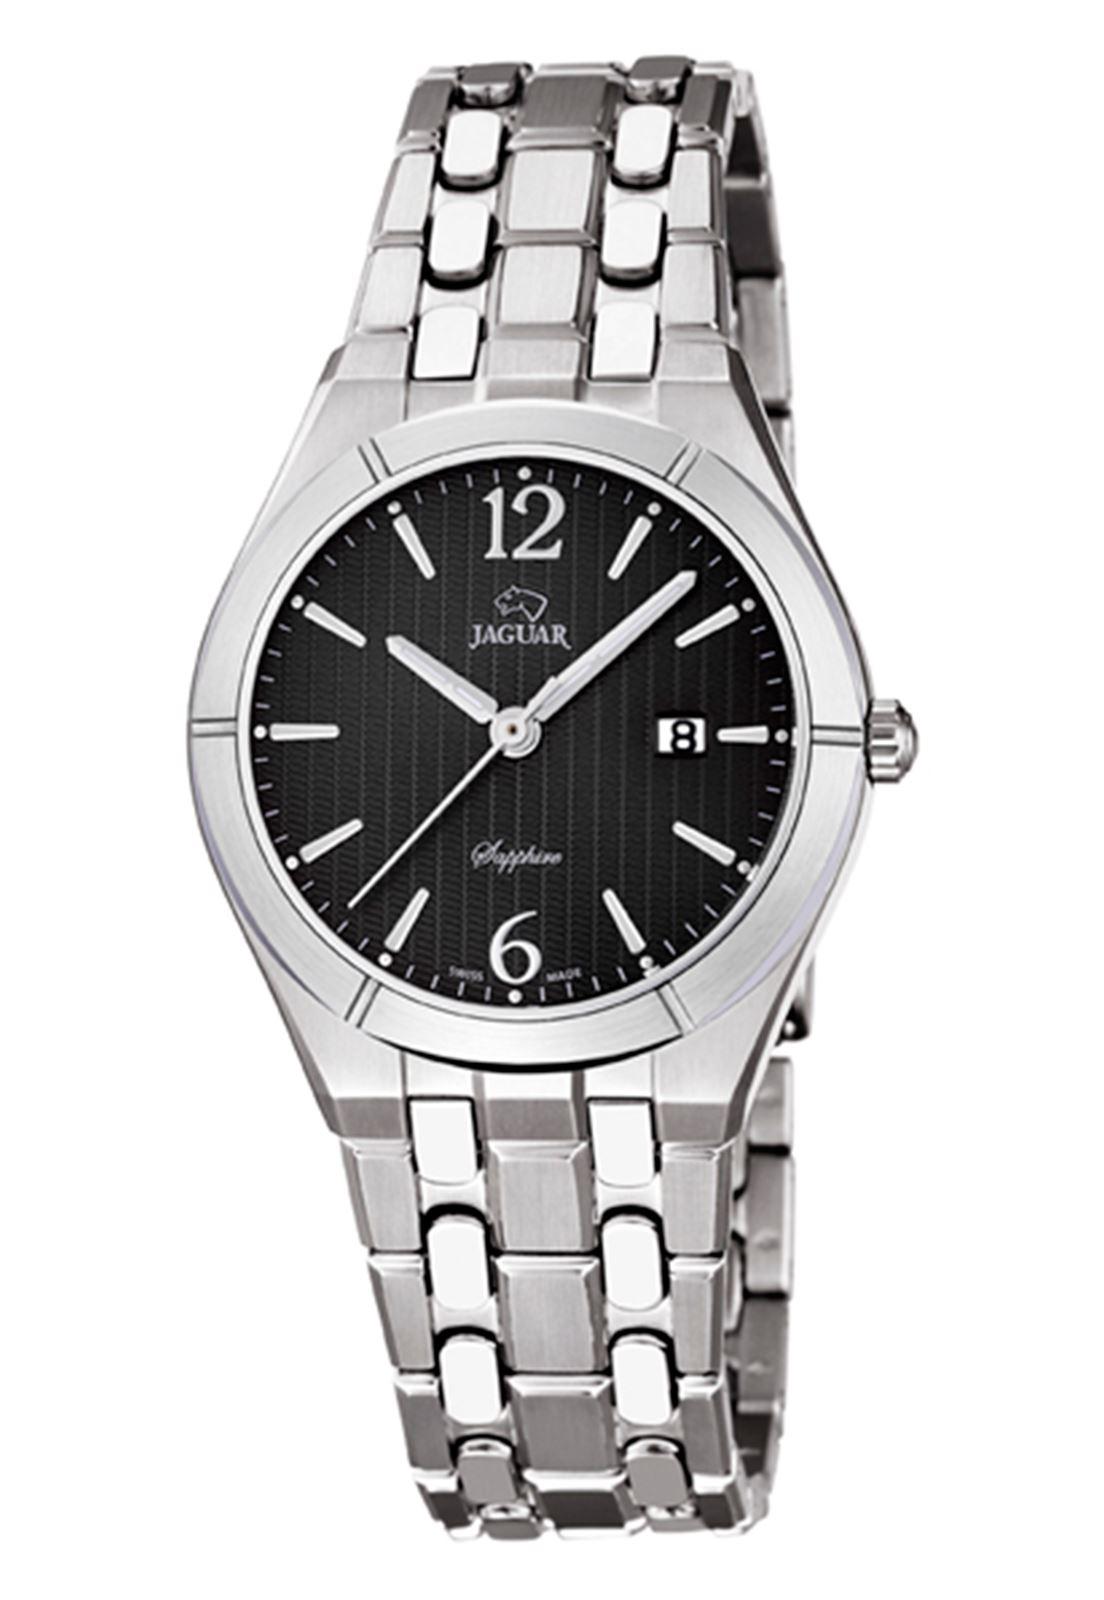 Jaguar Daily Class J629 H Daily Class Reloj